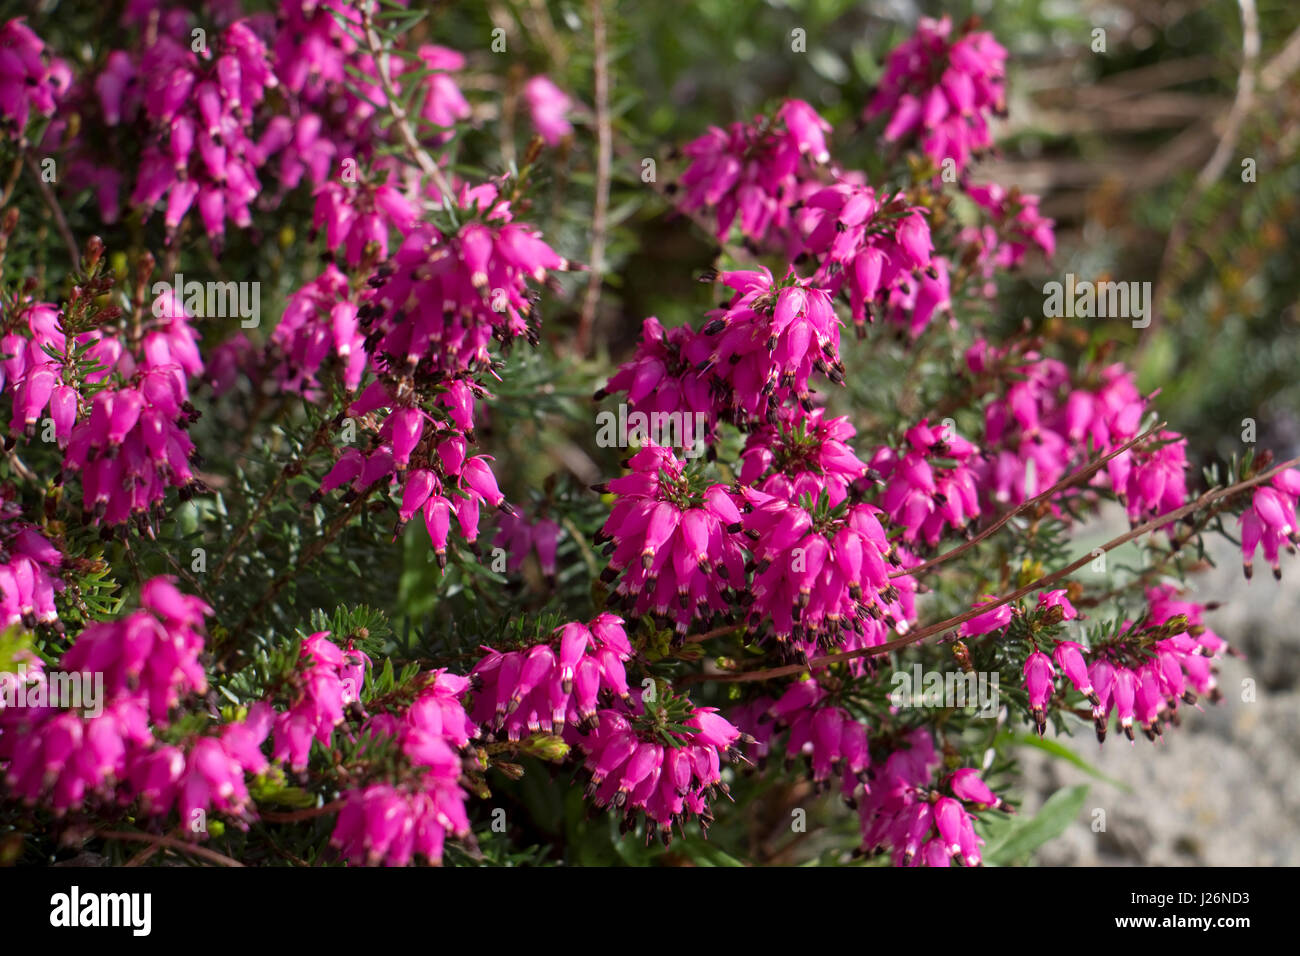 Dark pink heather flower close up stock photos dark pink heather spring flowering pink heather in flower stock image mightylinksfo